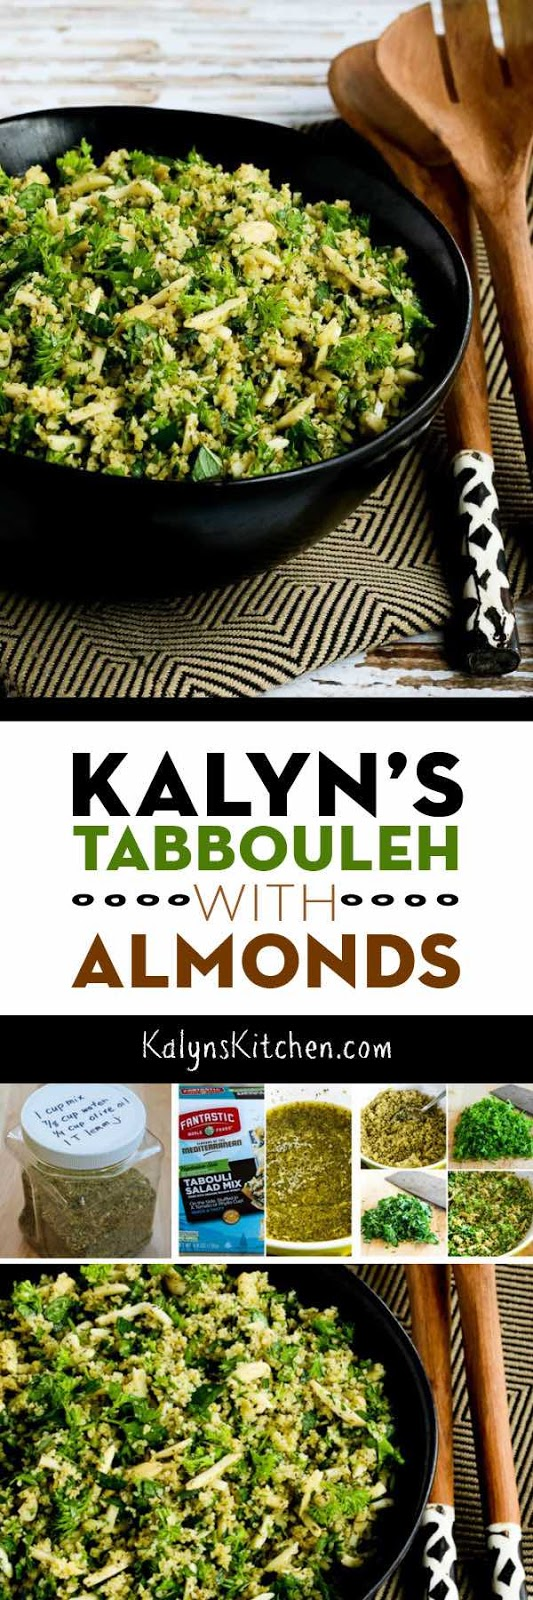 Kalyn's Tabbouleh With Almonds